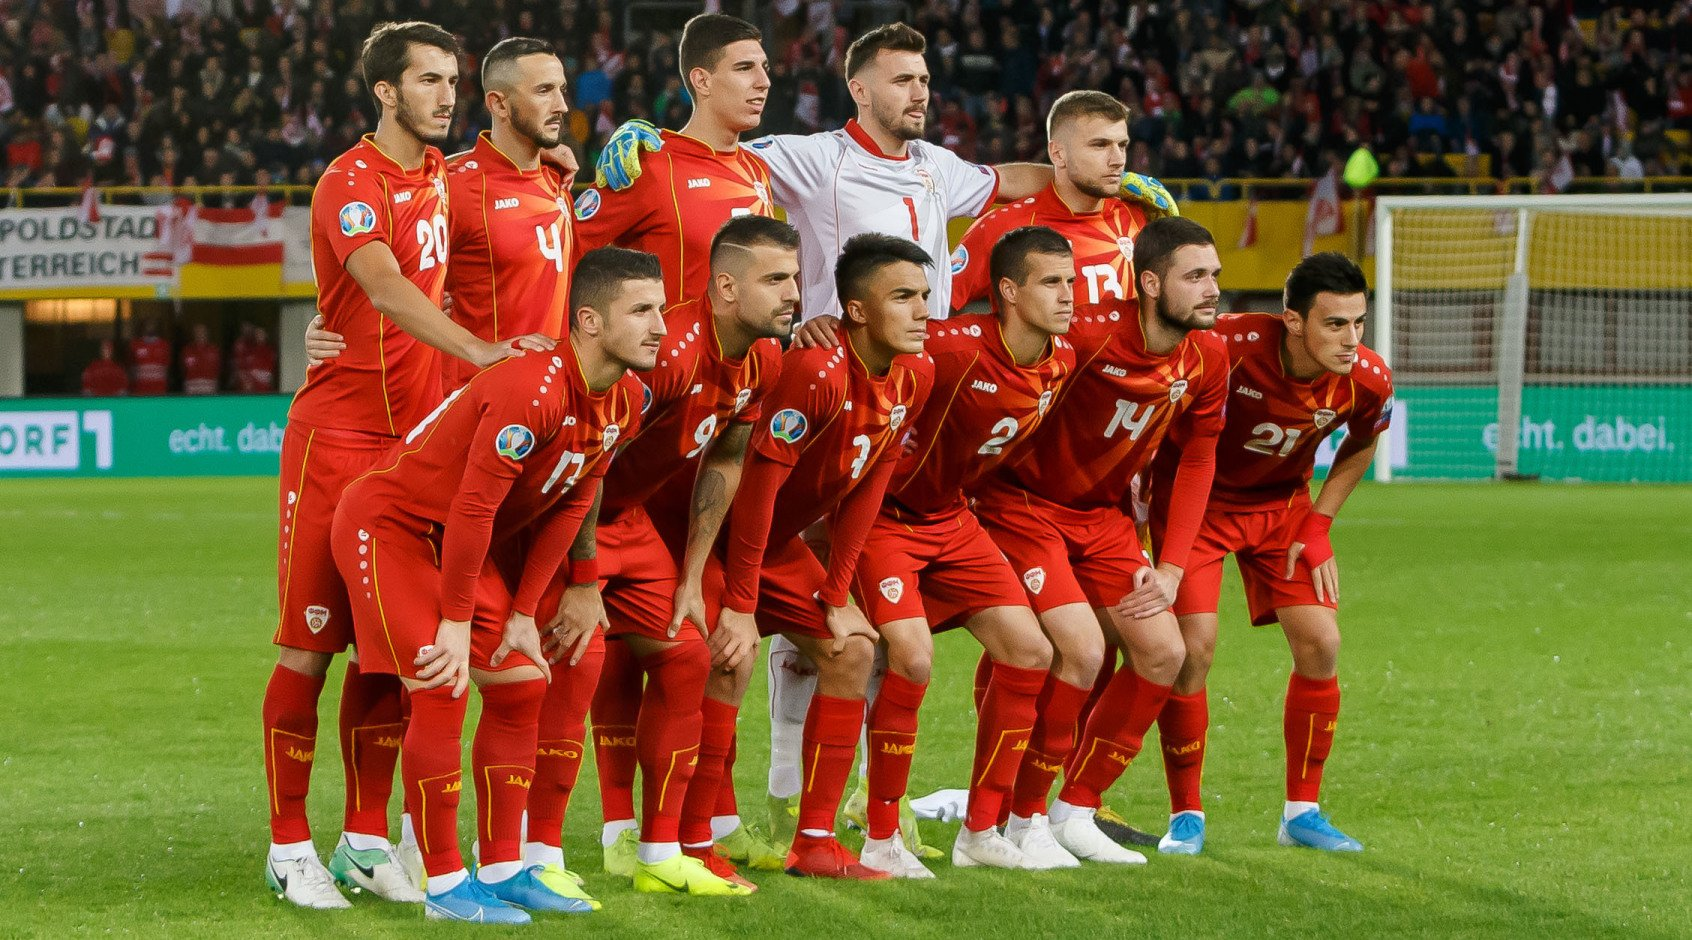 Гид по Евро. Группа C